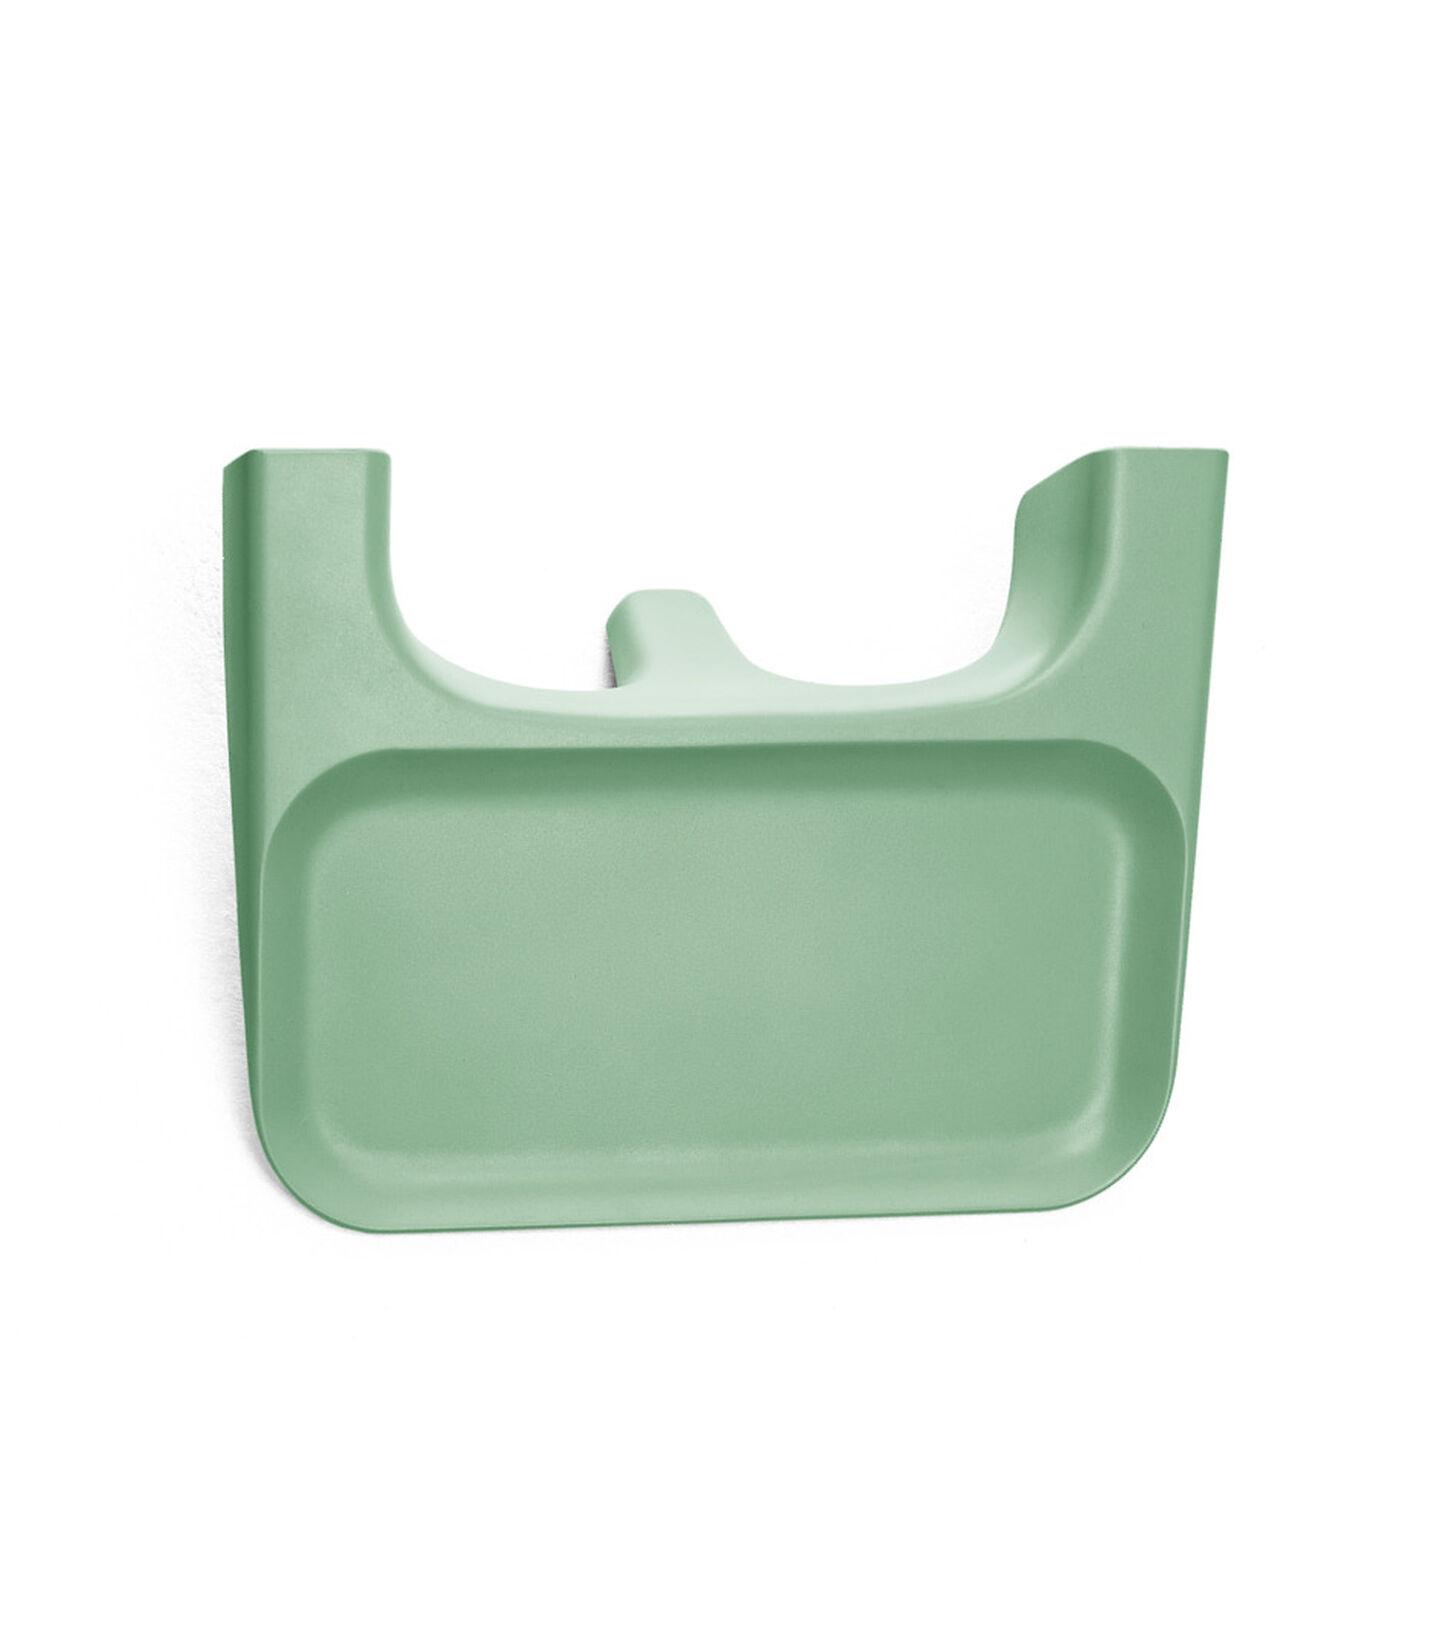 Stokke® Clikk™ Tray Clover Green, Clover Green, mainview view 2